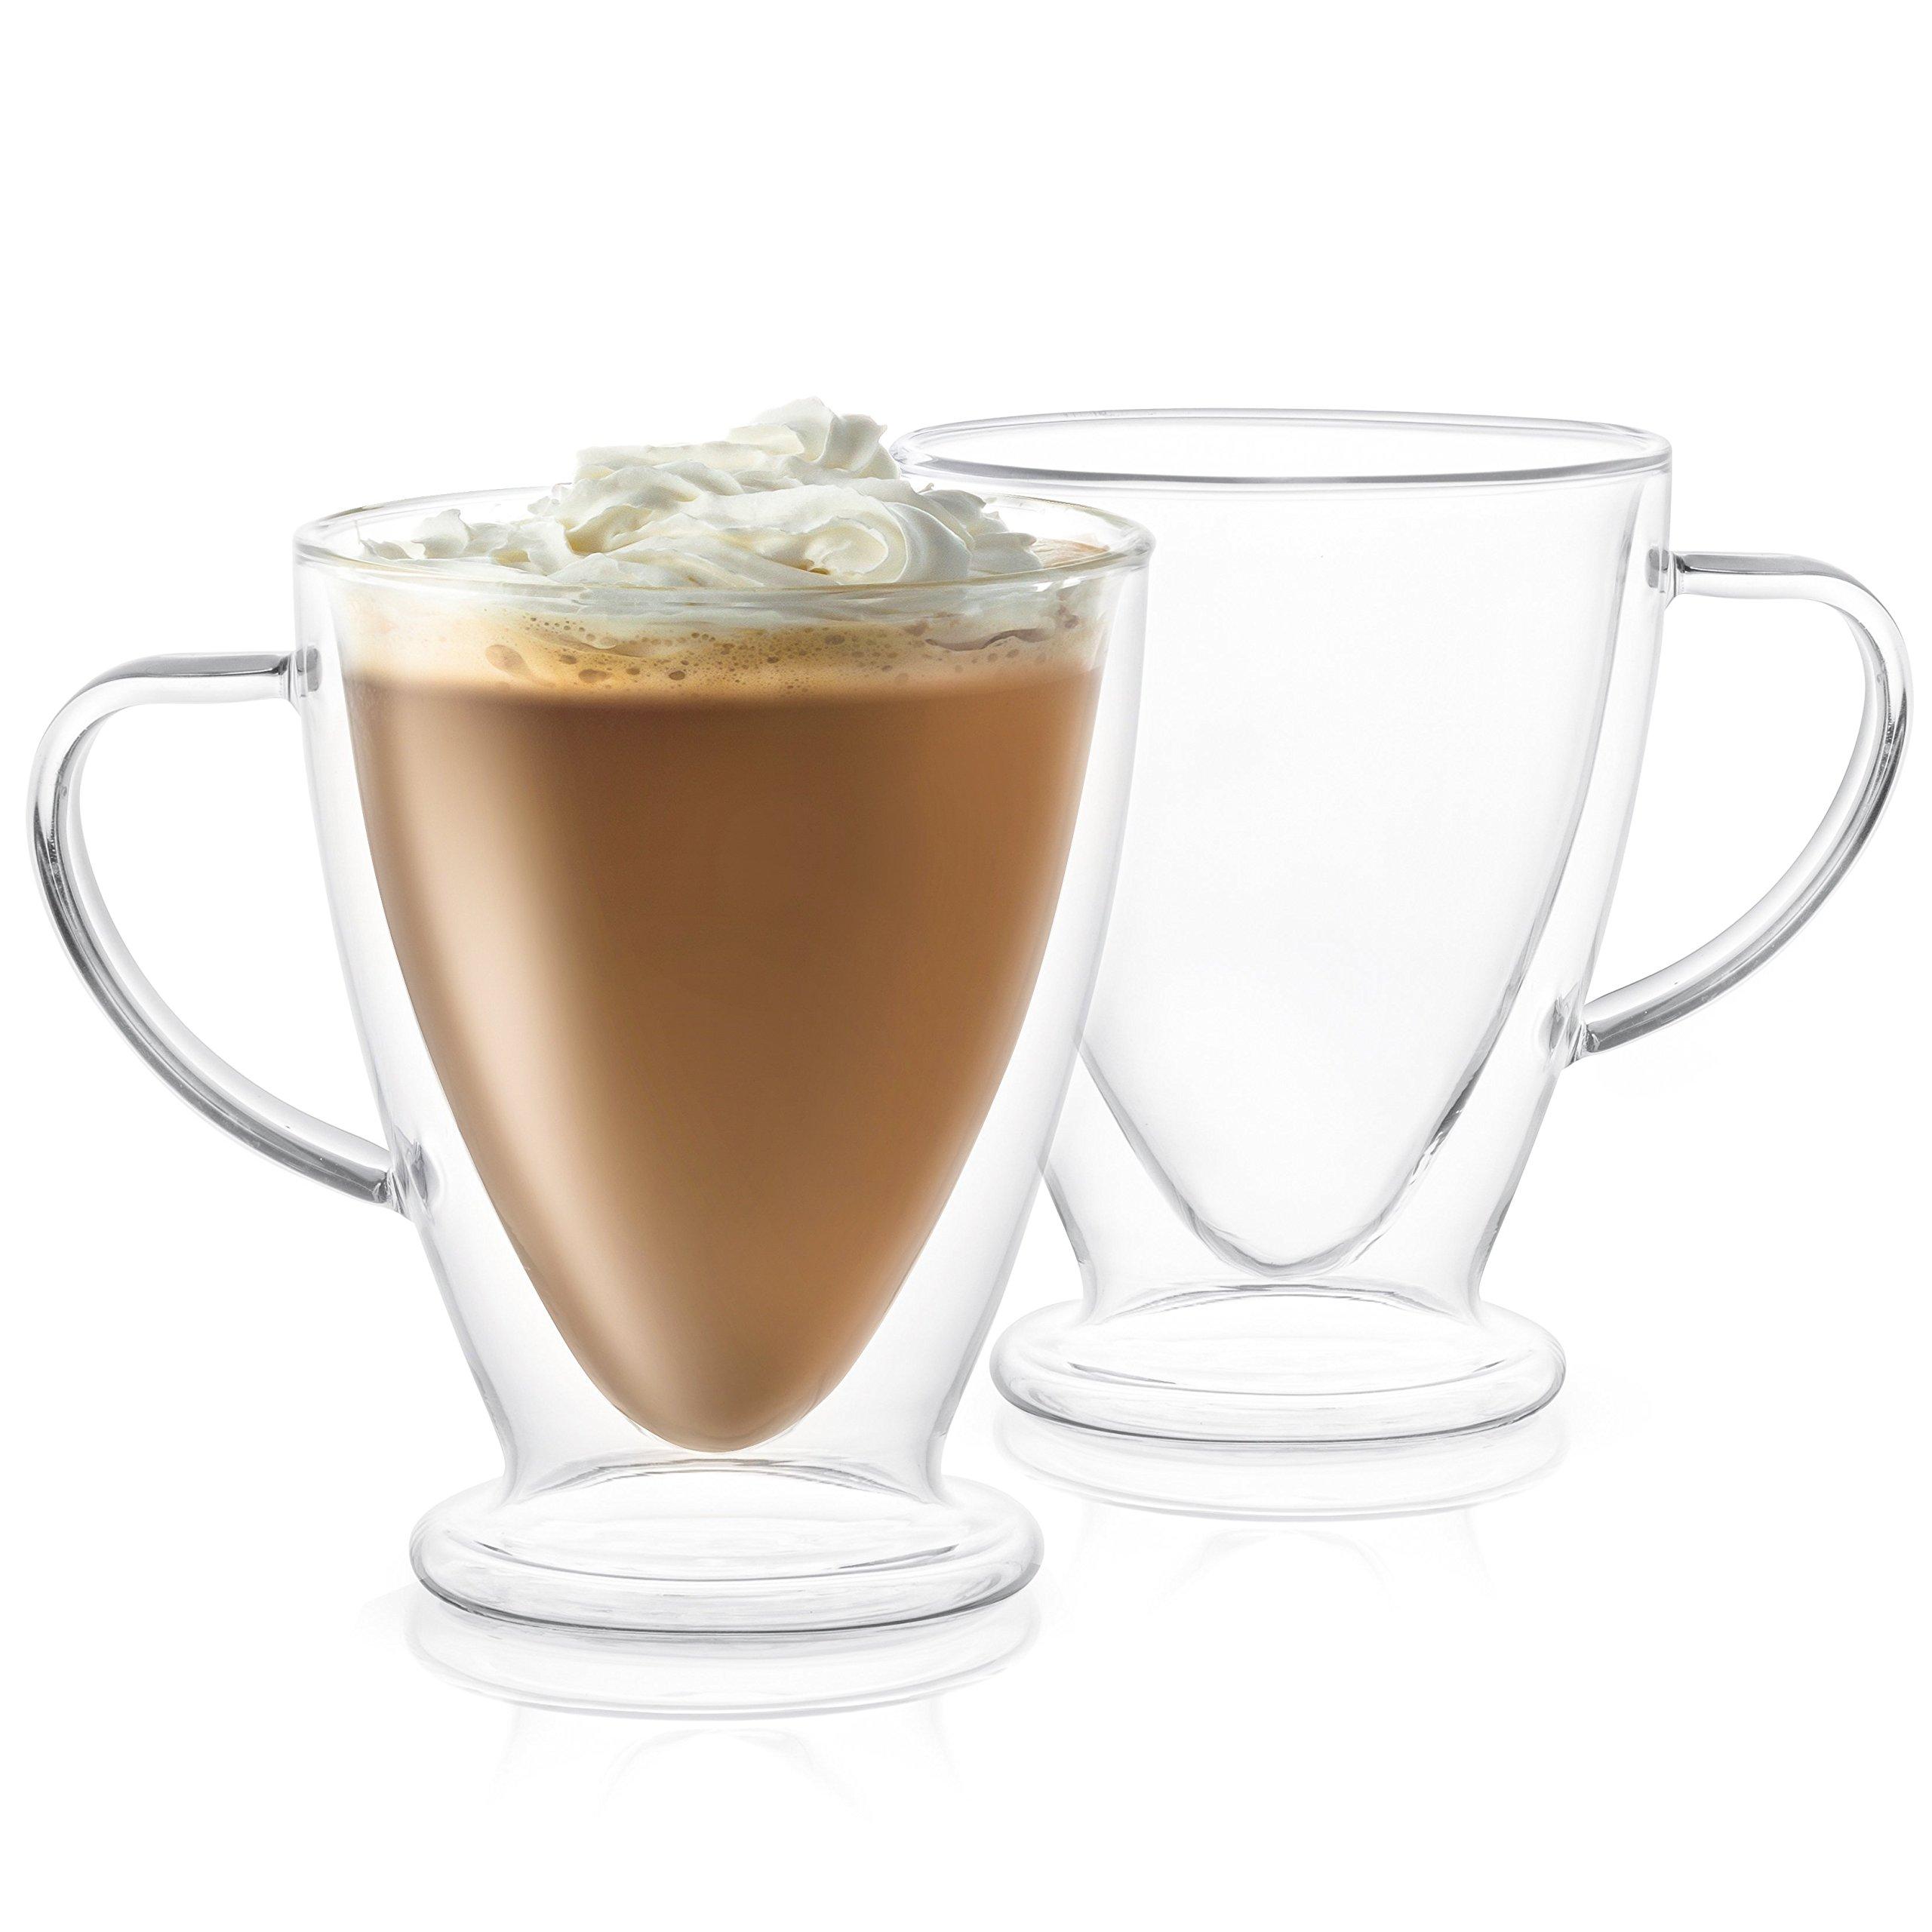 JoyJolt Declan Irish Glass Coffee Cups Double Wall Insulated Mugs Set of 2 Latte Glasses, 15-Ounces.